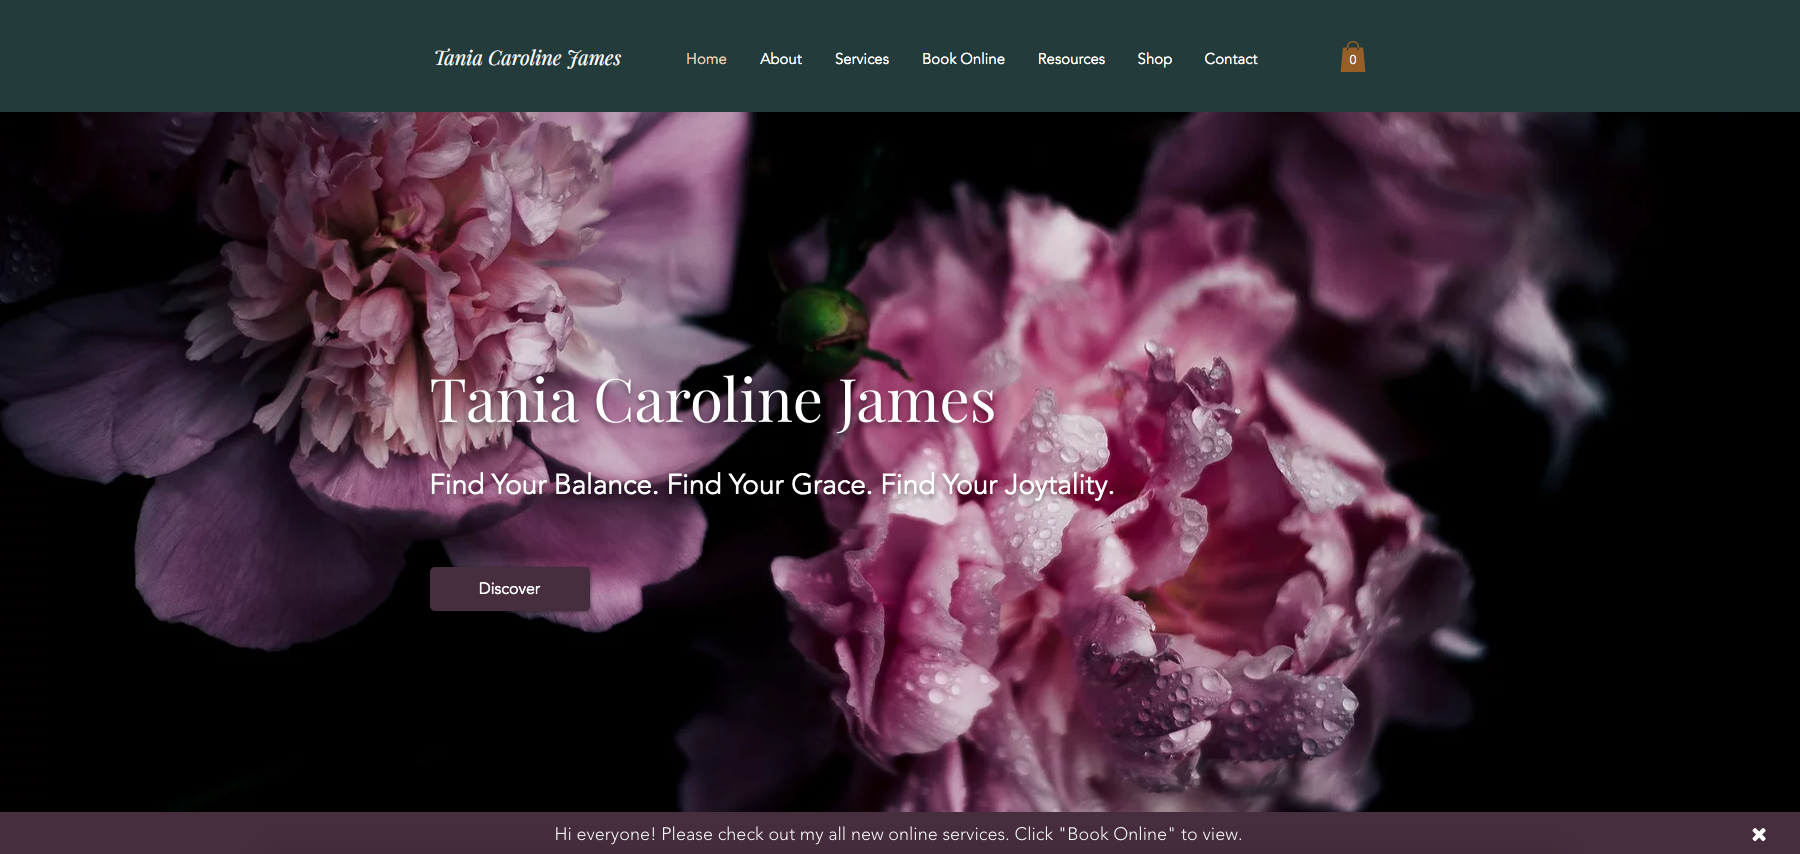 Tania Caroline James